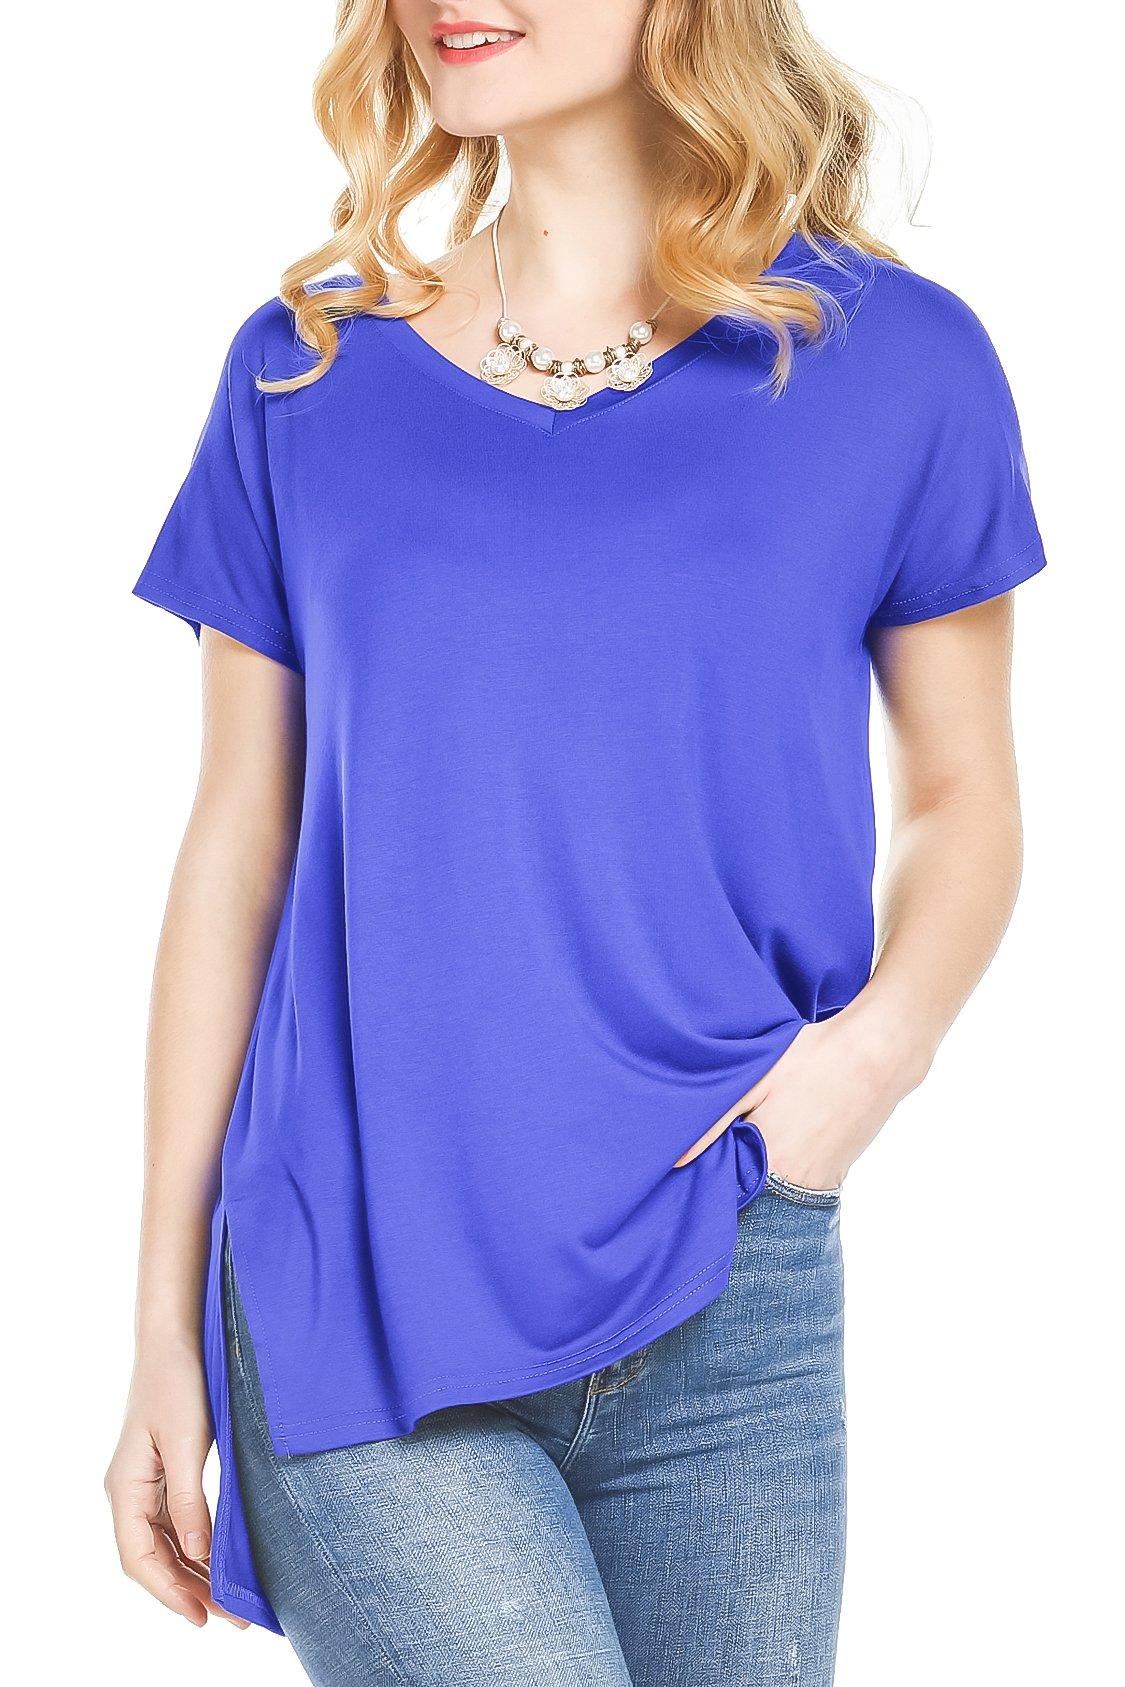 Florboom Summer Tops for Women Flowy V Neck T Shirts Short Sleeve Blouses Plain Royal Blue XL